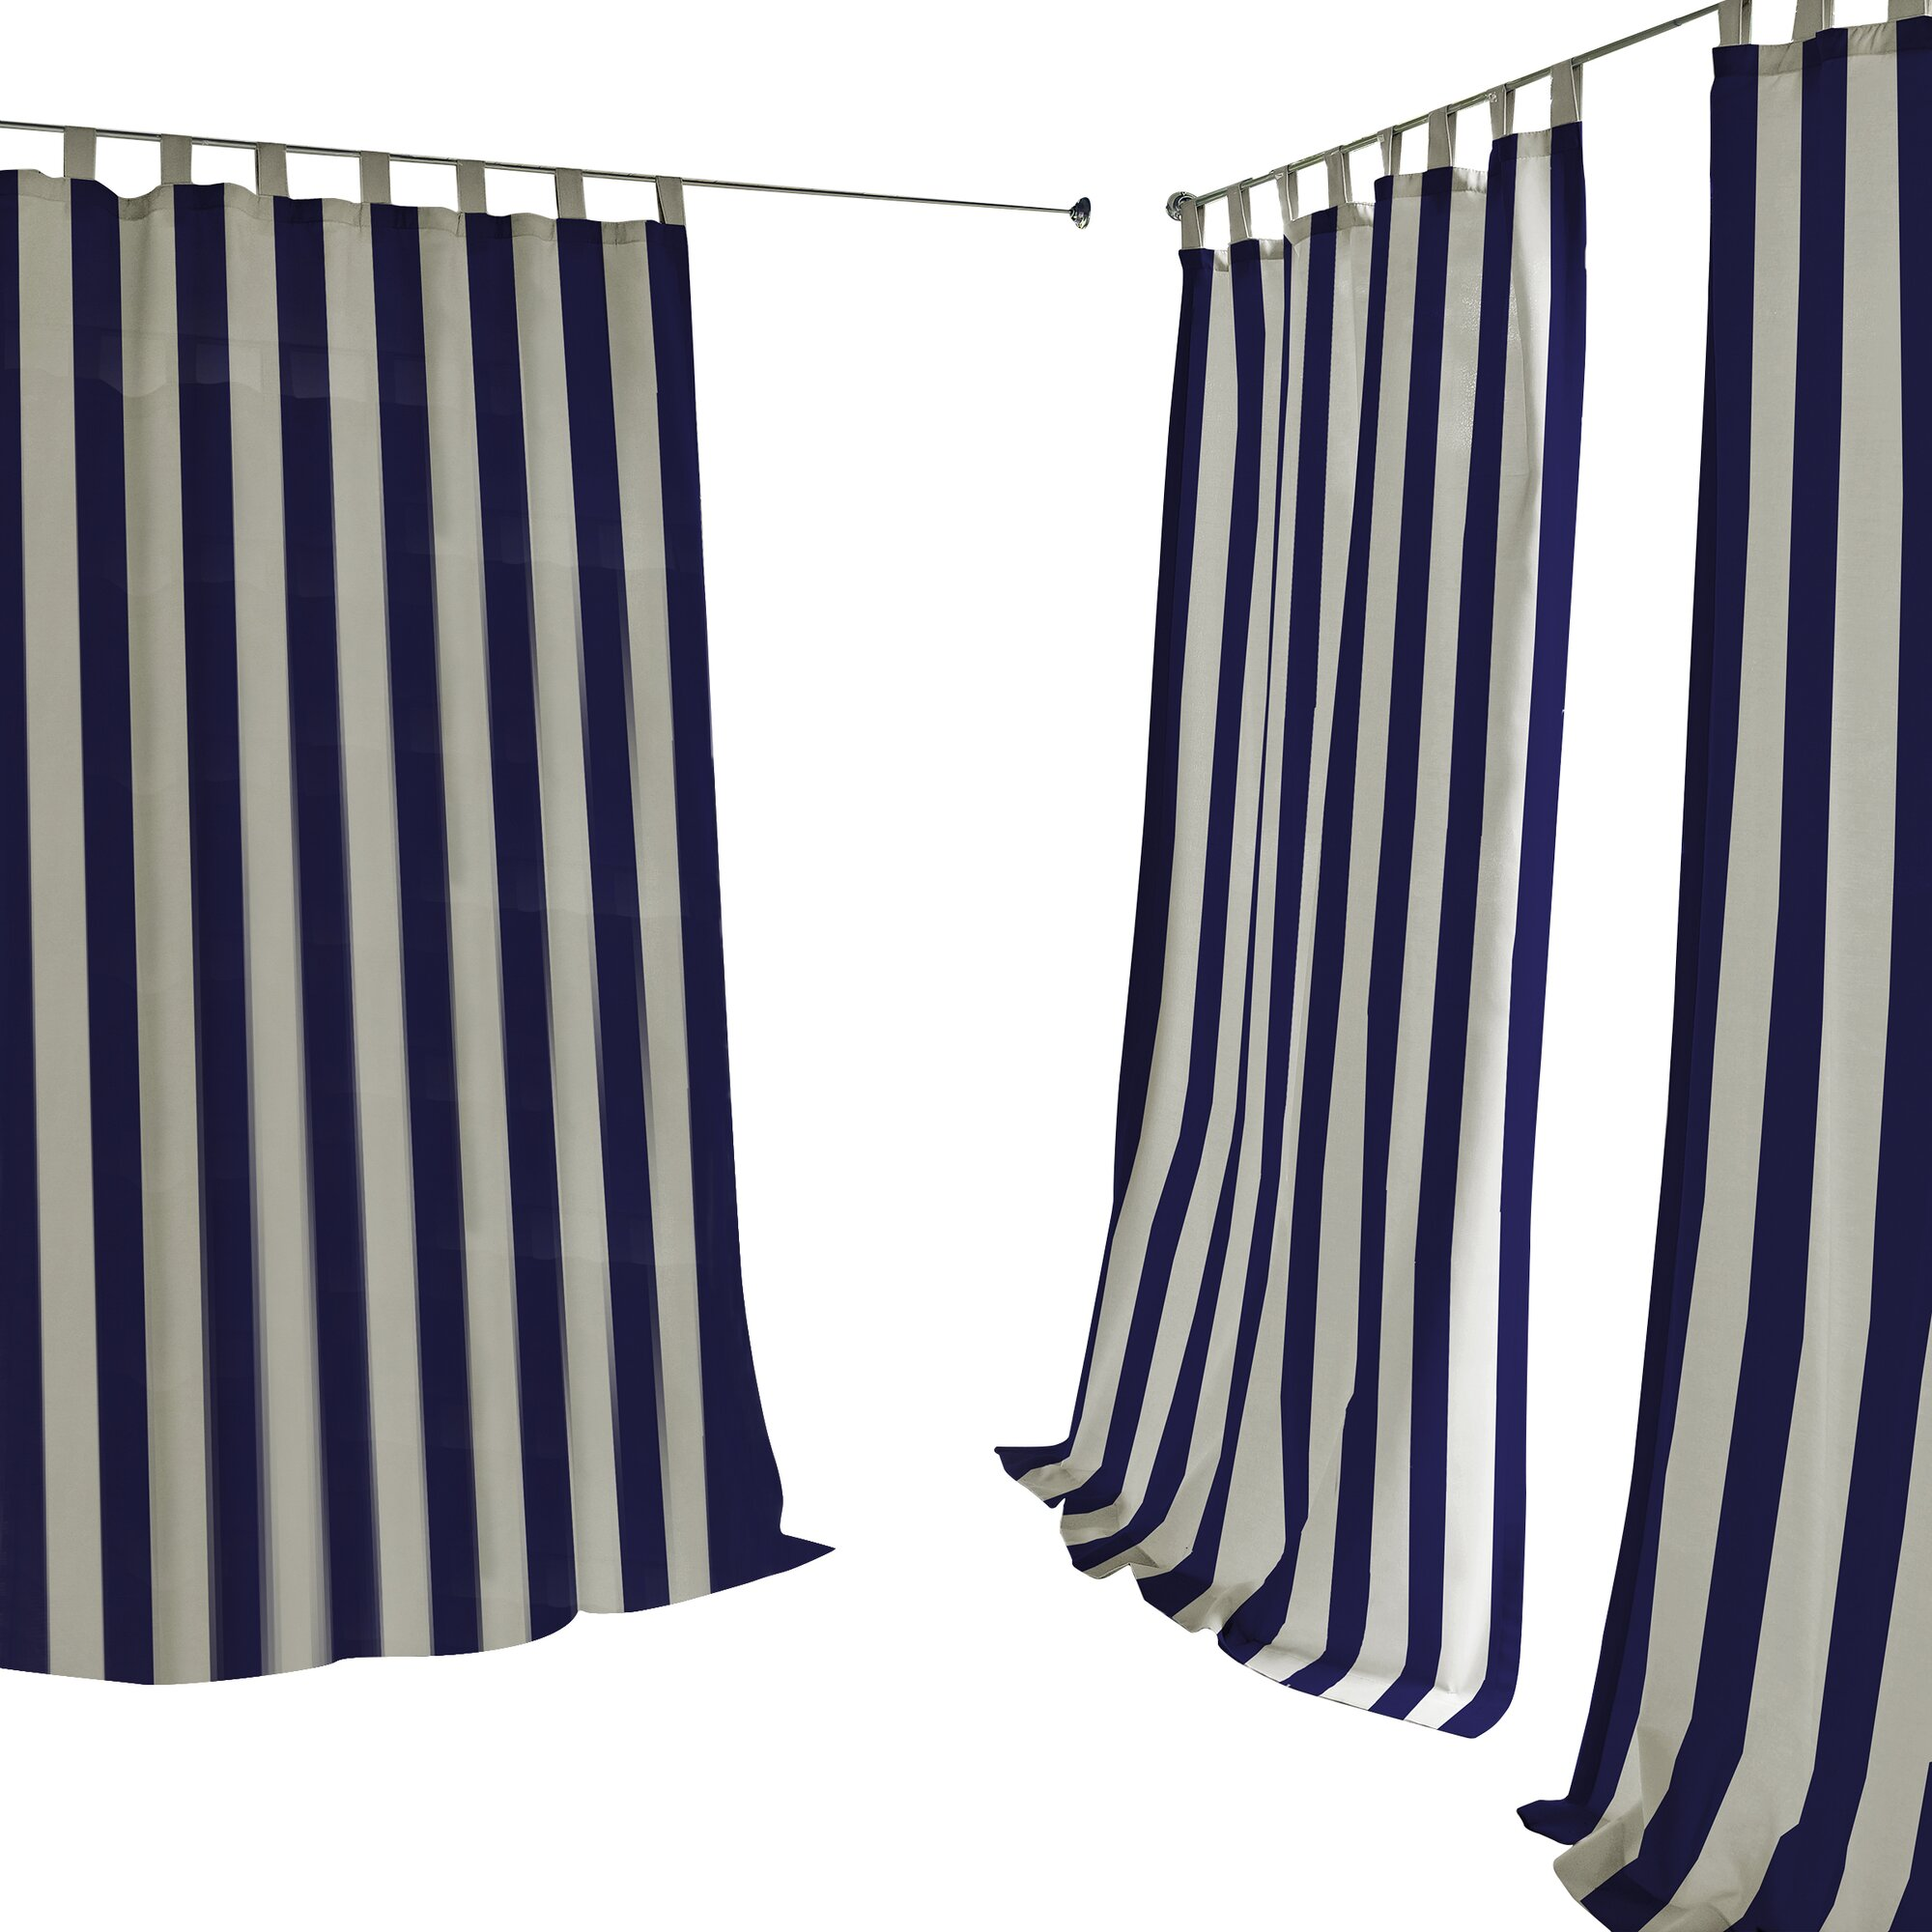 Sheer outdoor curtains - Bay Isle Home Briarton Highland Stripe Semi Sheer Outdoor Tab Top Single Curtain Panel Reviews Wayfair